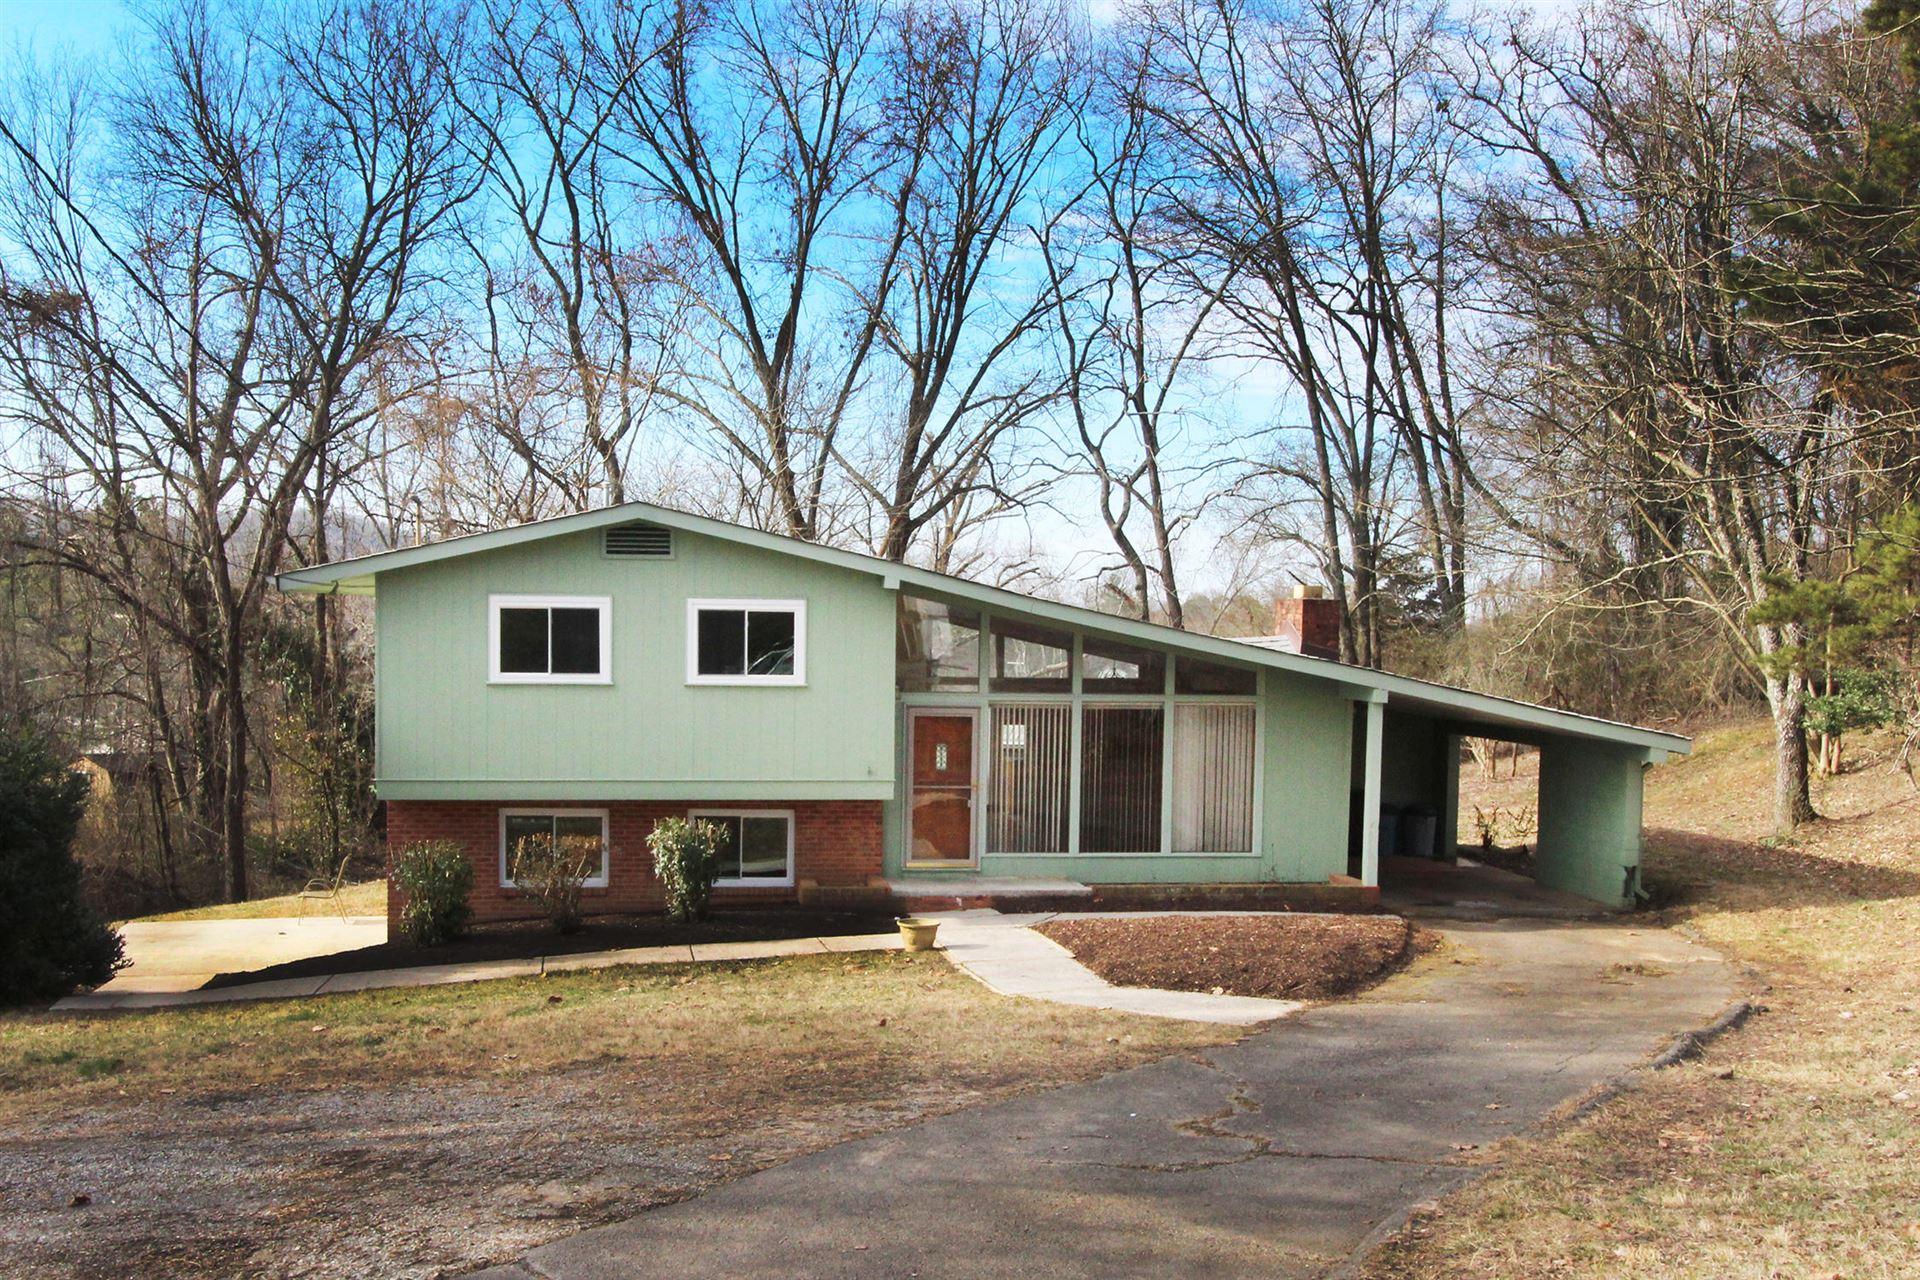 Photo of 107 N Seneca Rd, Oak Ridge, TN 37830 (MLS # 1143314)